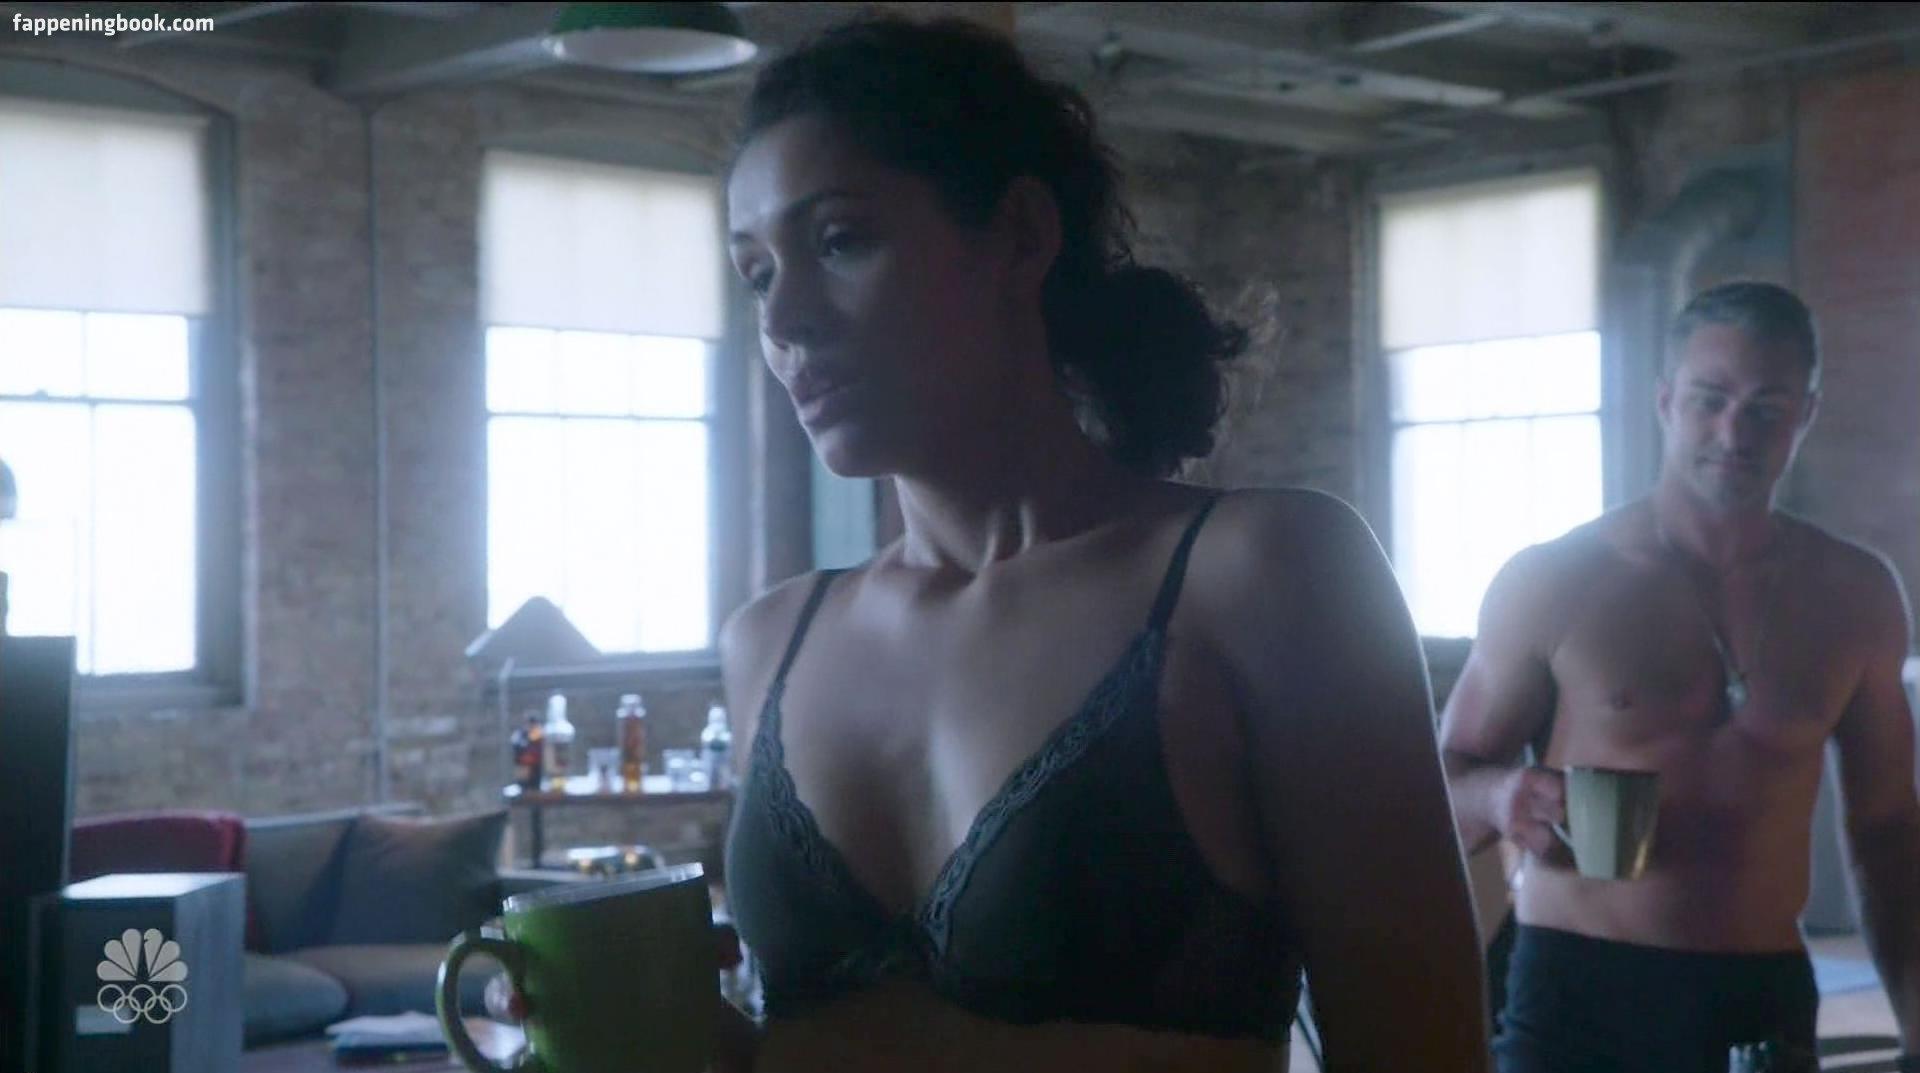 Rae nude miranda mayo Hot 10: